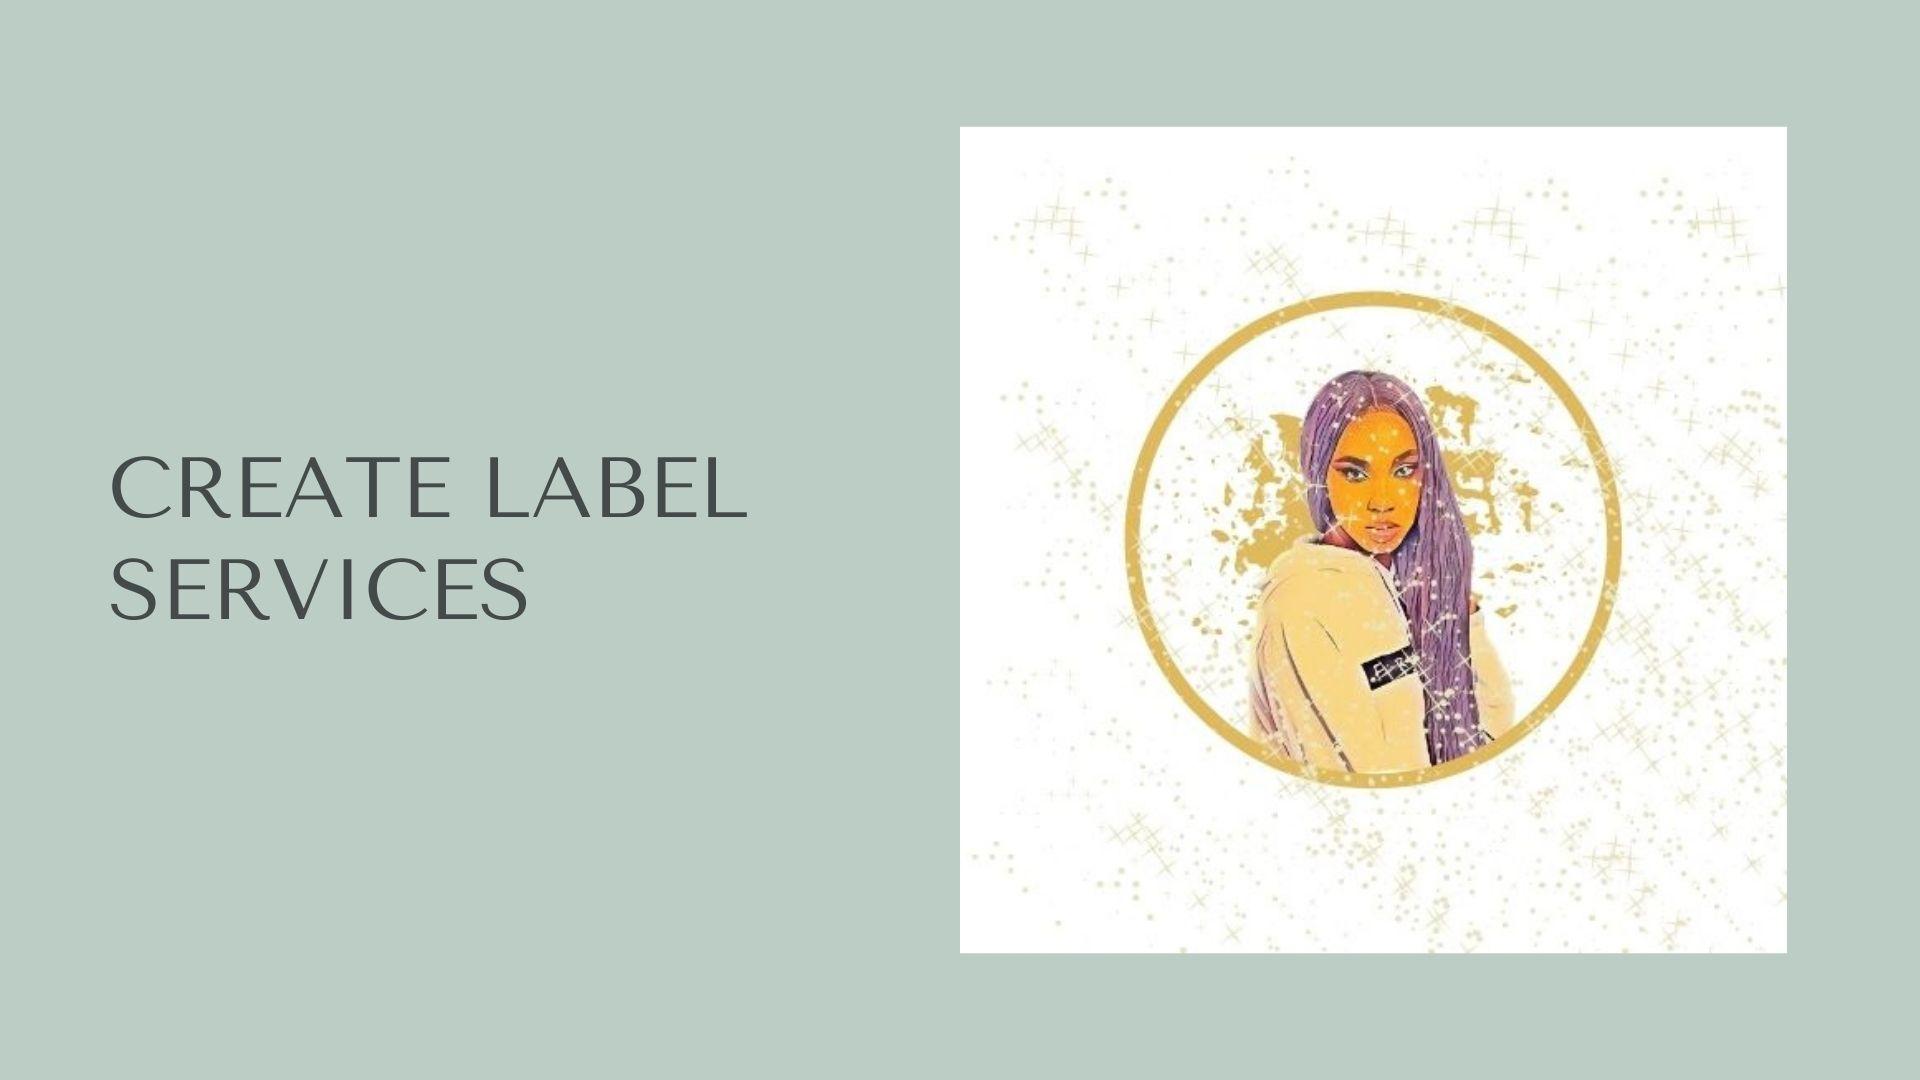 Create Label Services